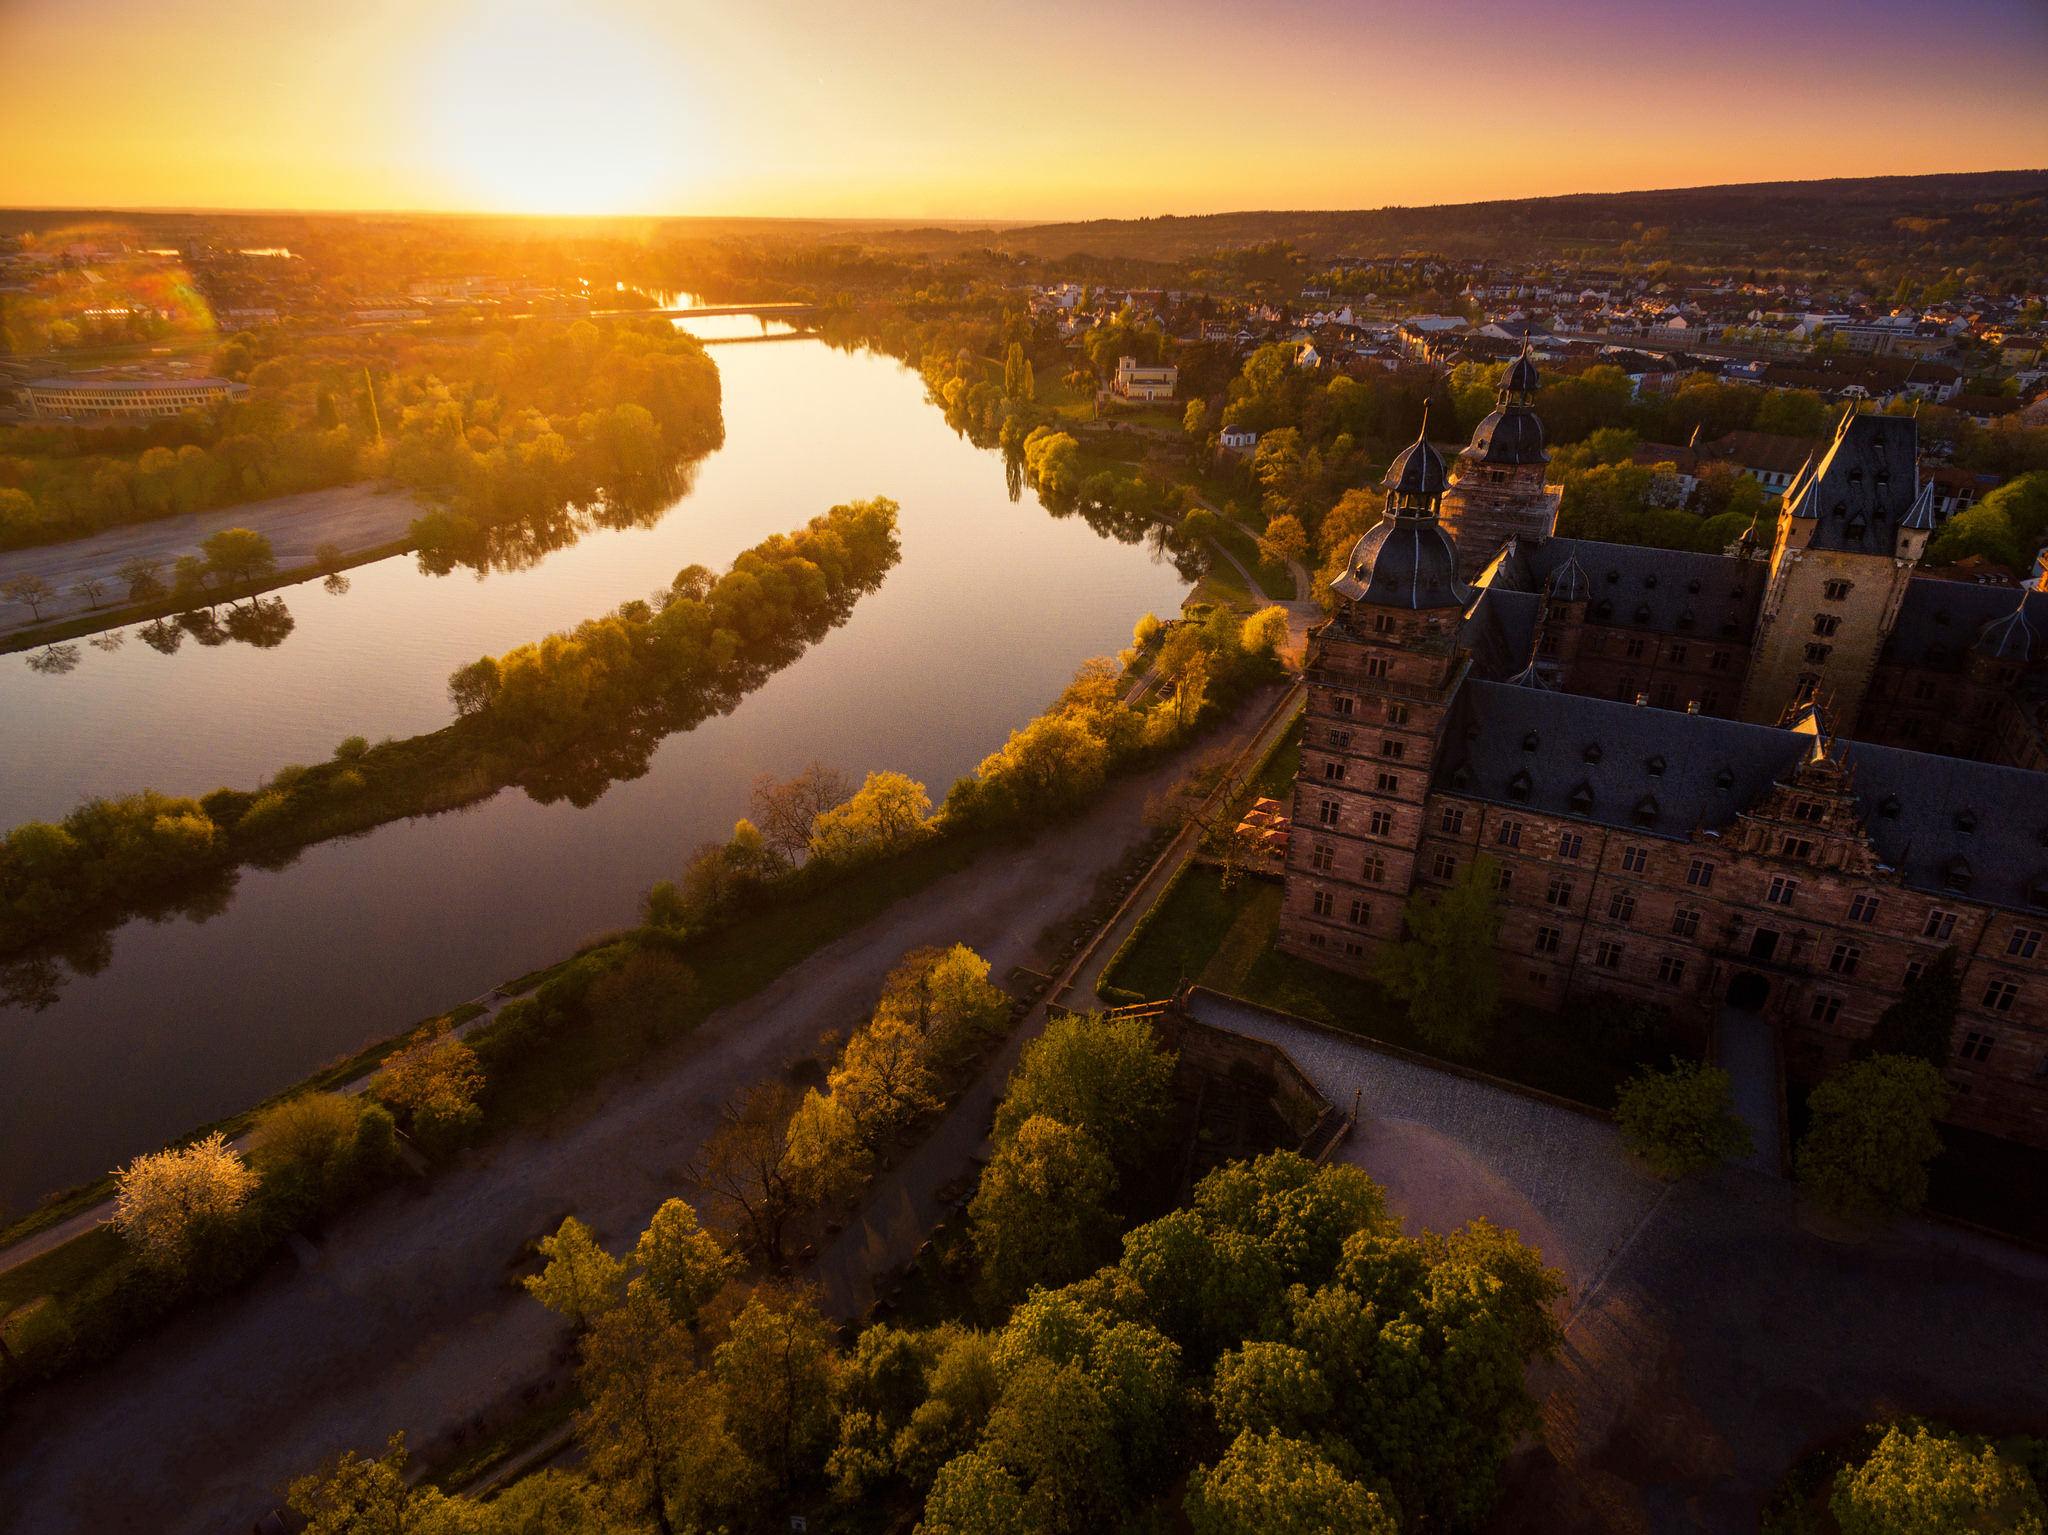 Landschaftsfotografie fotograf filmemacher frankfurt patrick schmetzer drohne landschaft natur 21